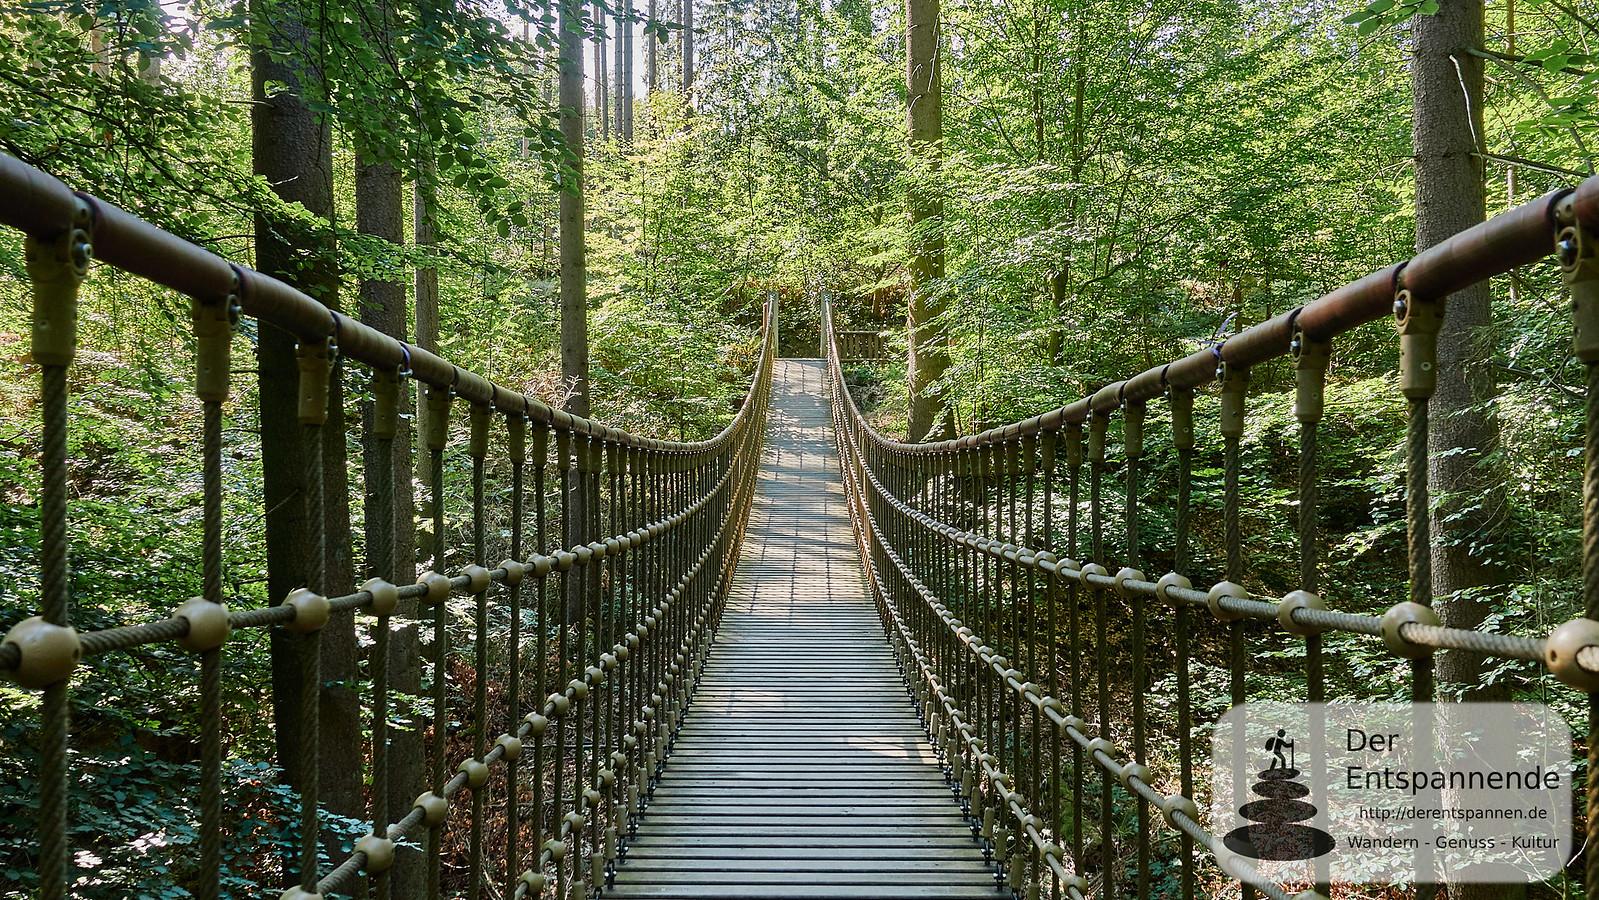 Hängebrücke im Binger Wald, Nähe Forsthaus Heiligkreuz